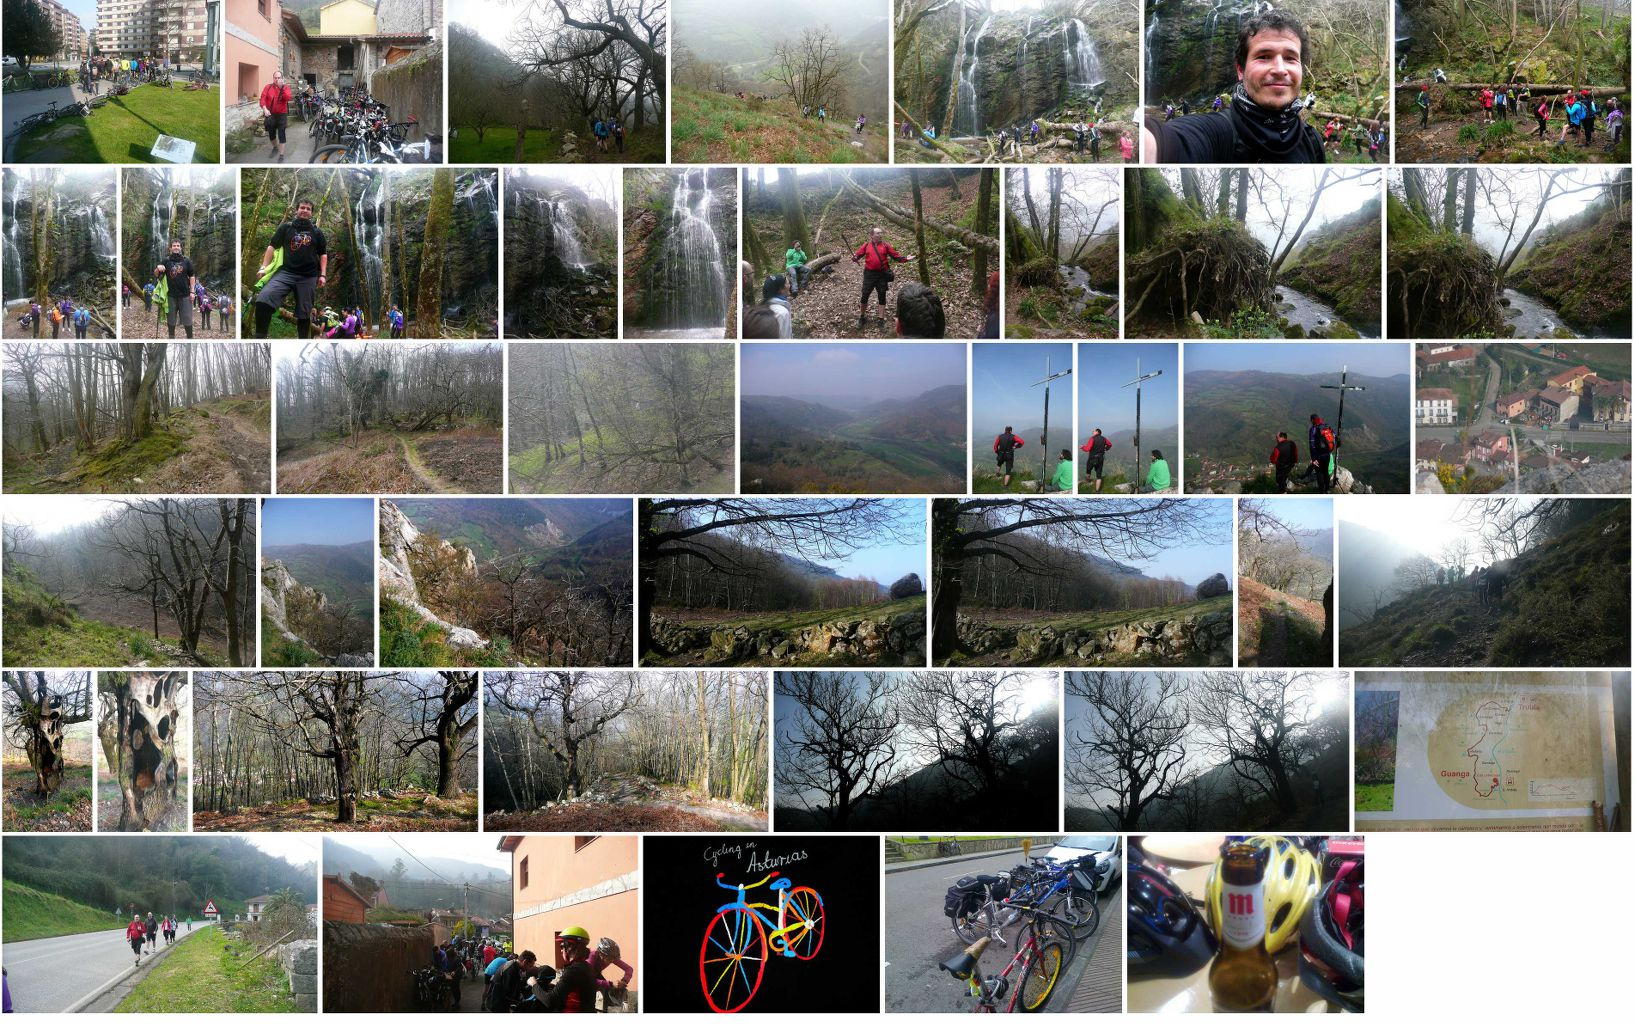 AcB-salida15.03.2014-unlbumdeFlickr.jpg